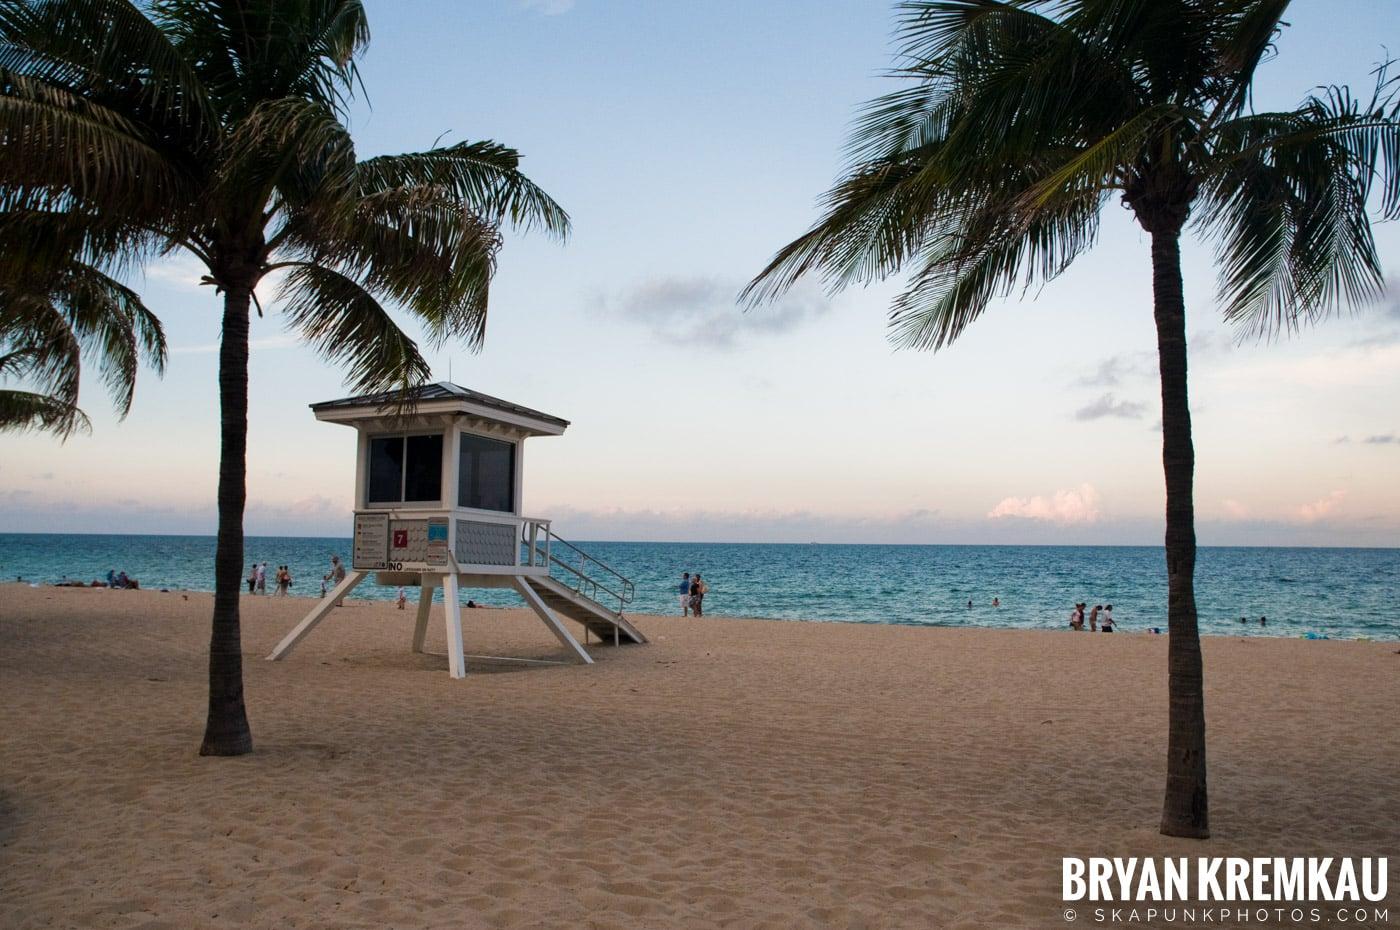 Florida Keys Vacation - 7.09.10 - 7.15.10 (95)